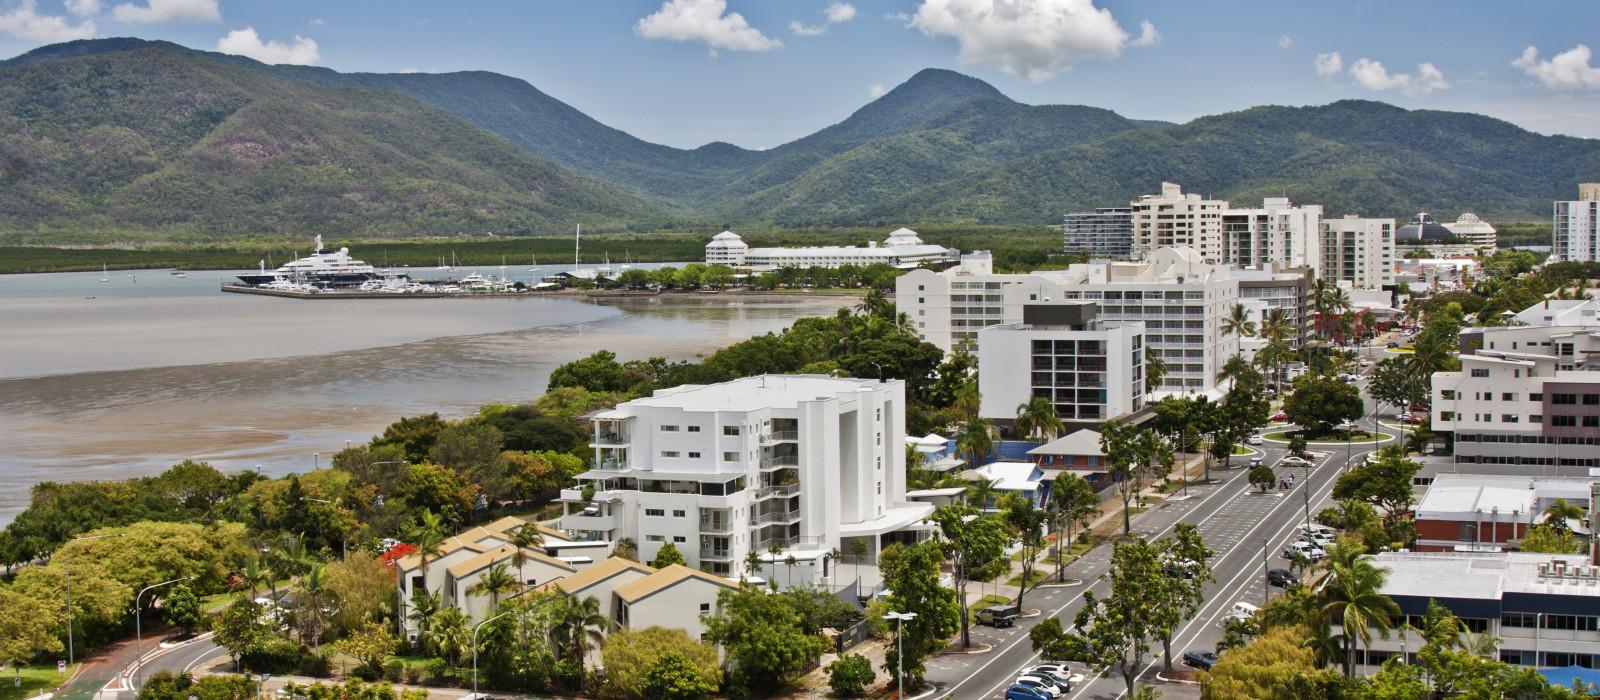 Reiseziel Cairns Australien